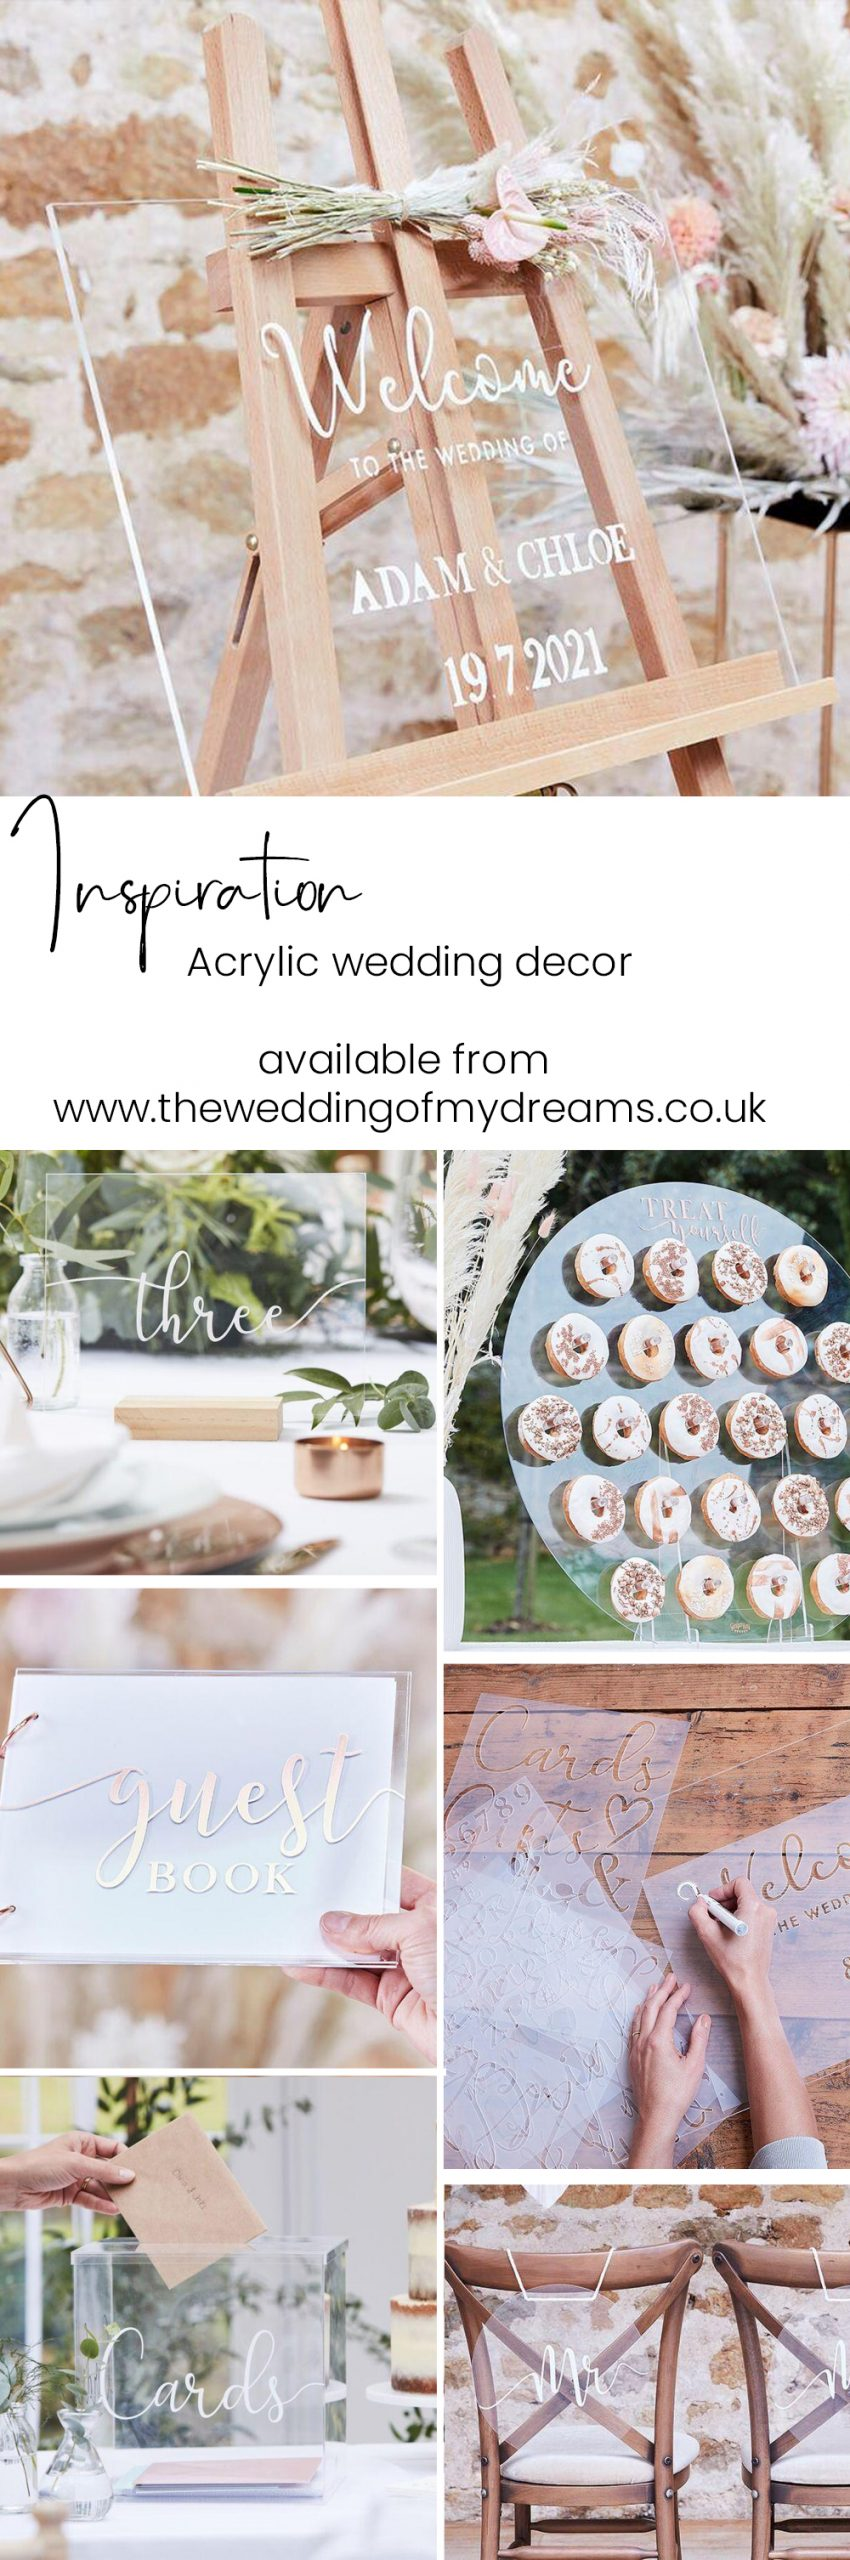 acrylic wedding decorations